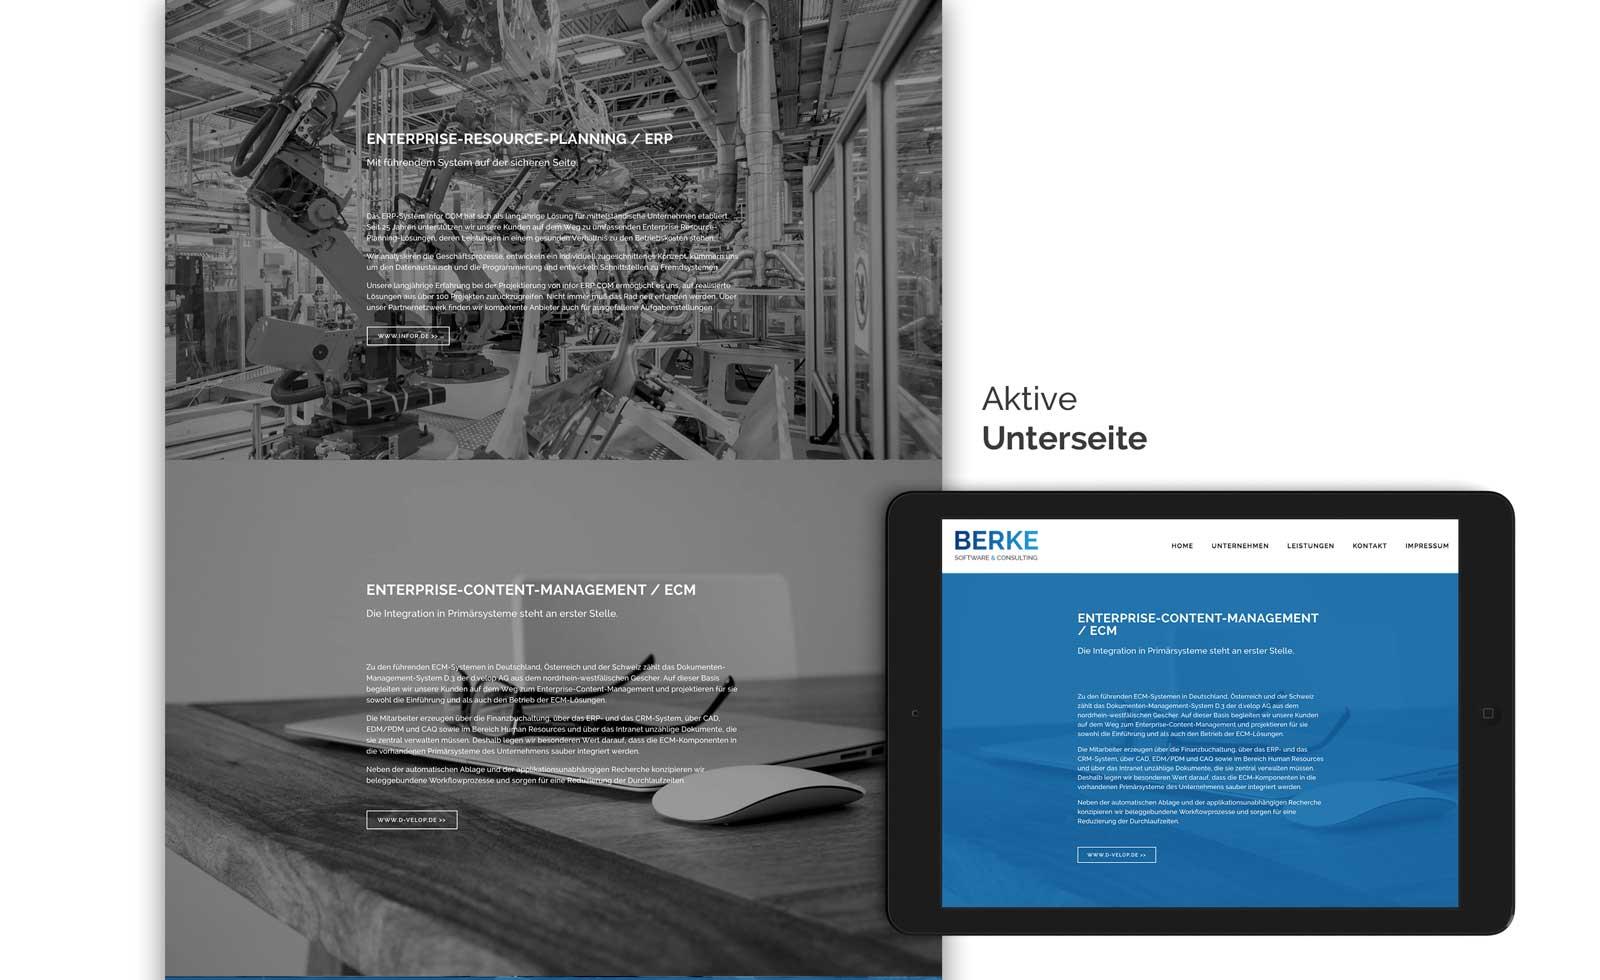 Berke_IT_Corporate_Design_Responsive_Webdesign_6.jpg